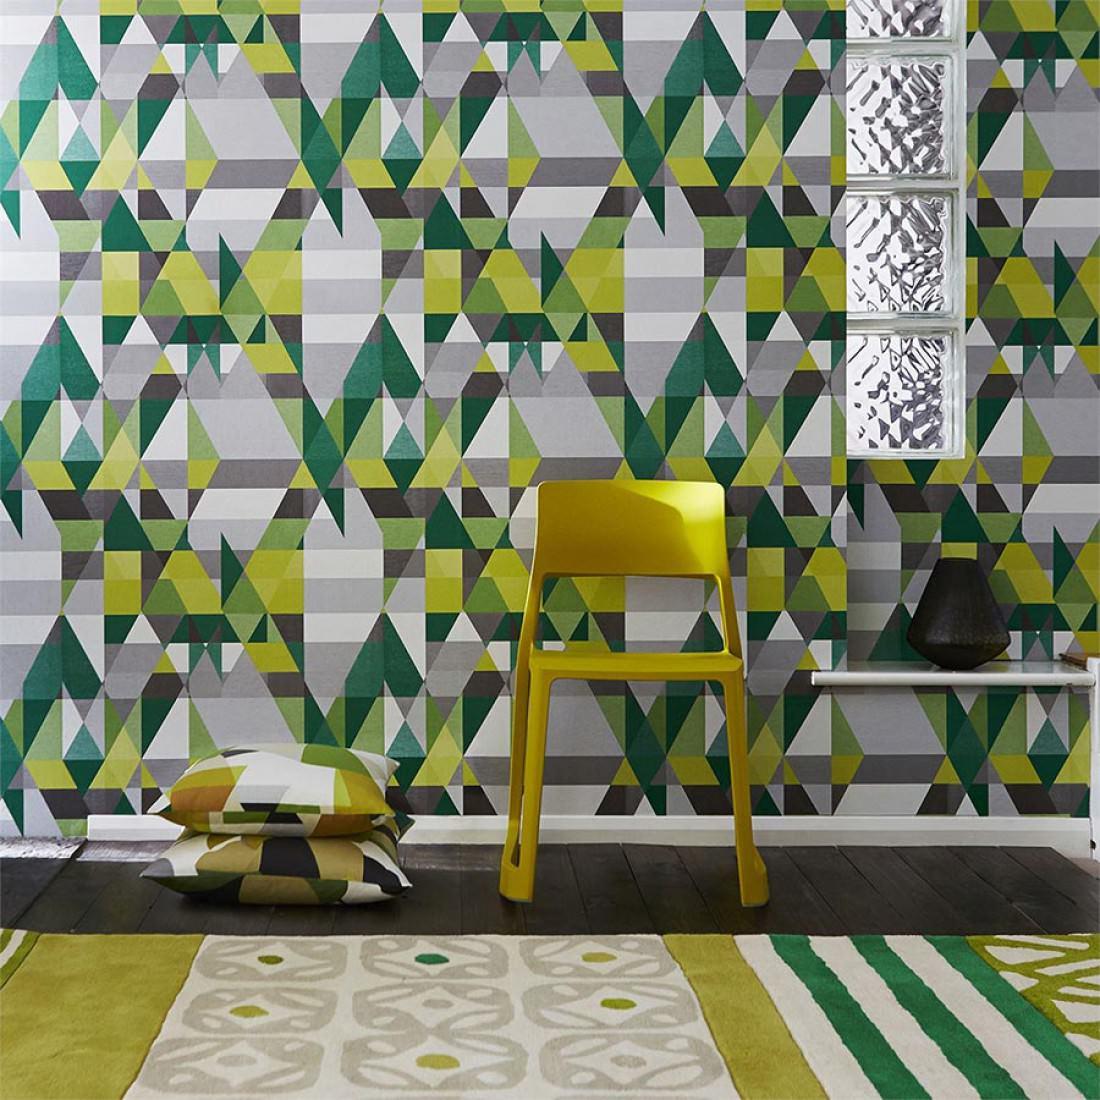 Wallpaper Zewana Dark Grey Yellow Green Green Green Yellow